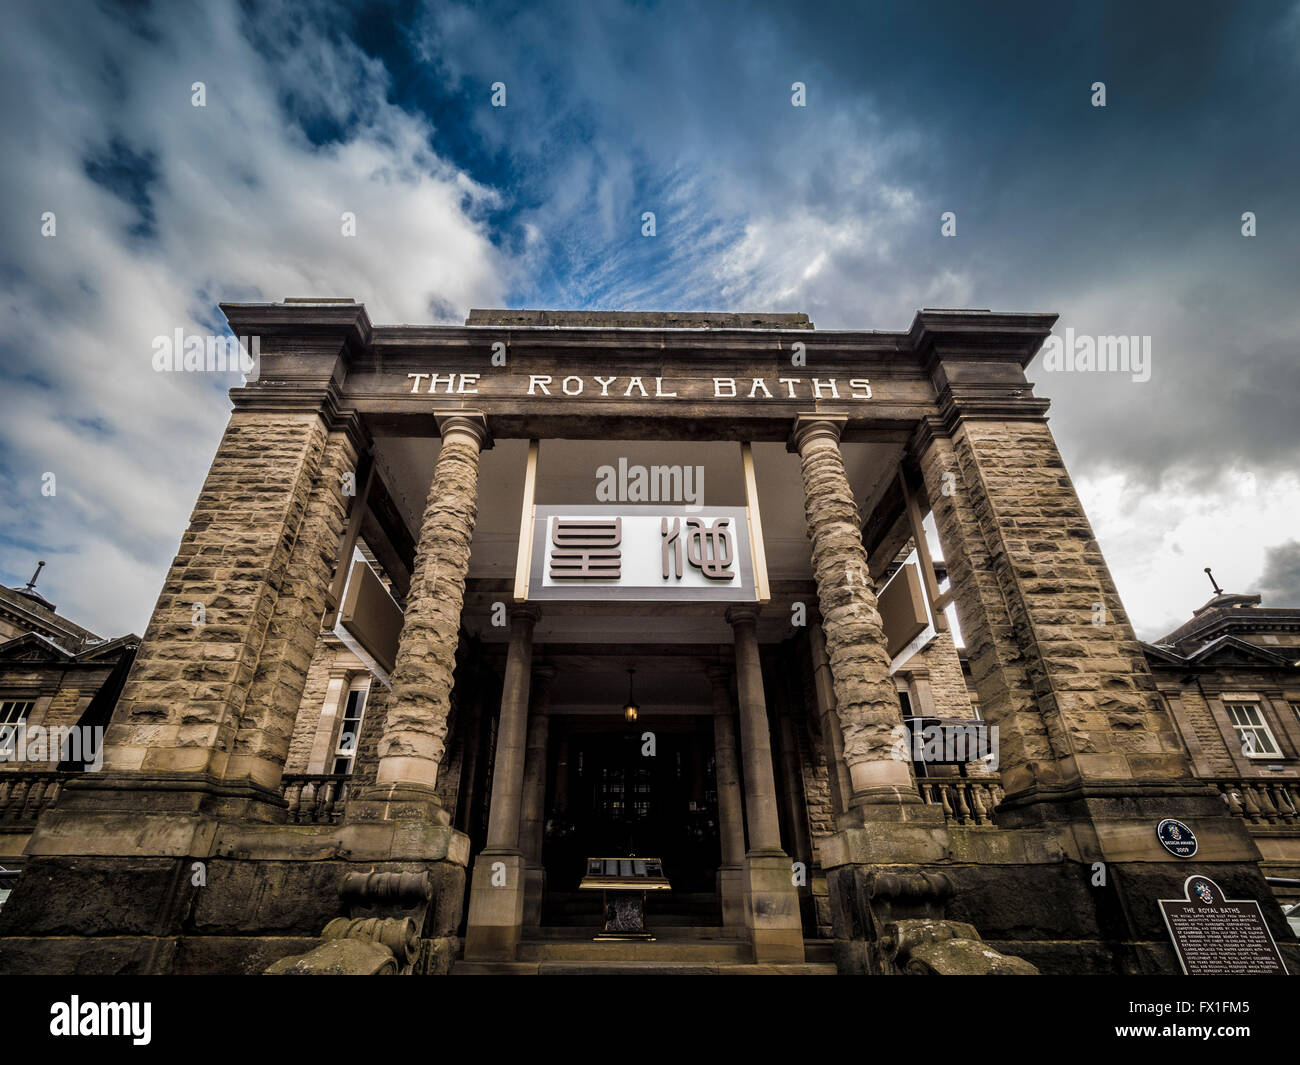 The Royal Baths exterior signage, Harrogate, North Yorkshire, UK. - Stock Image